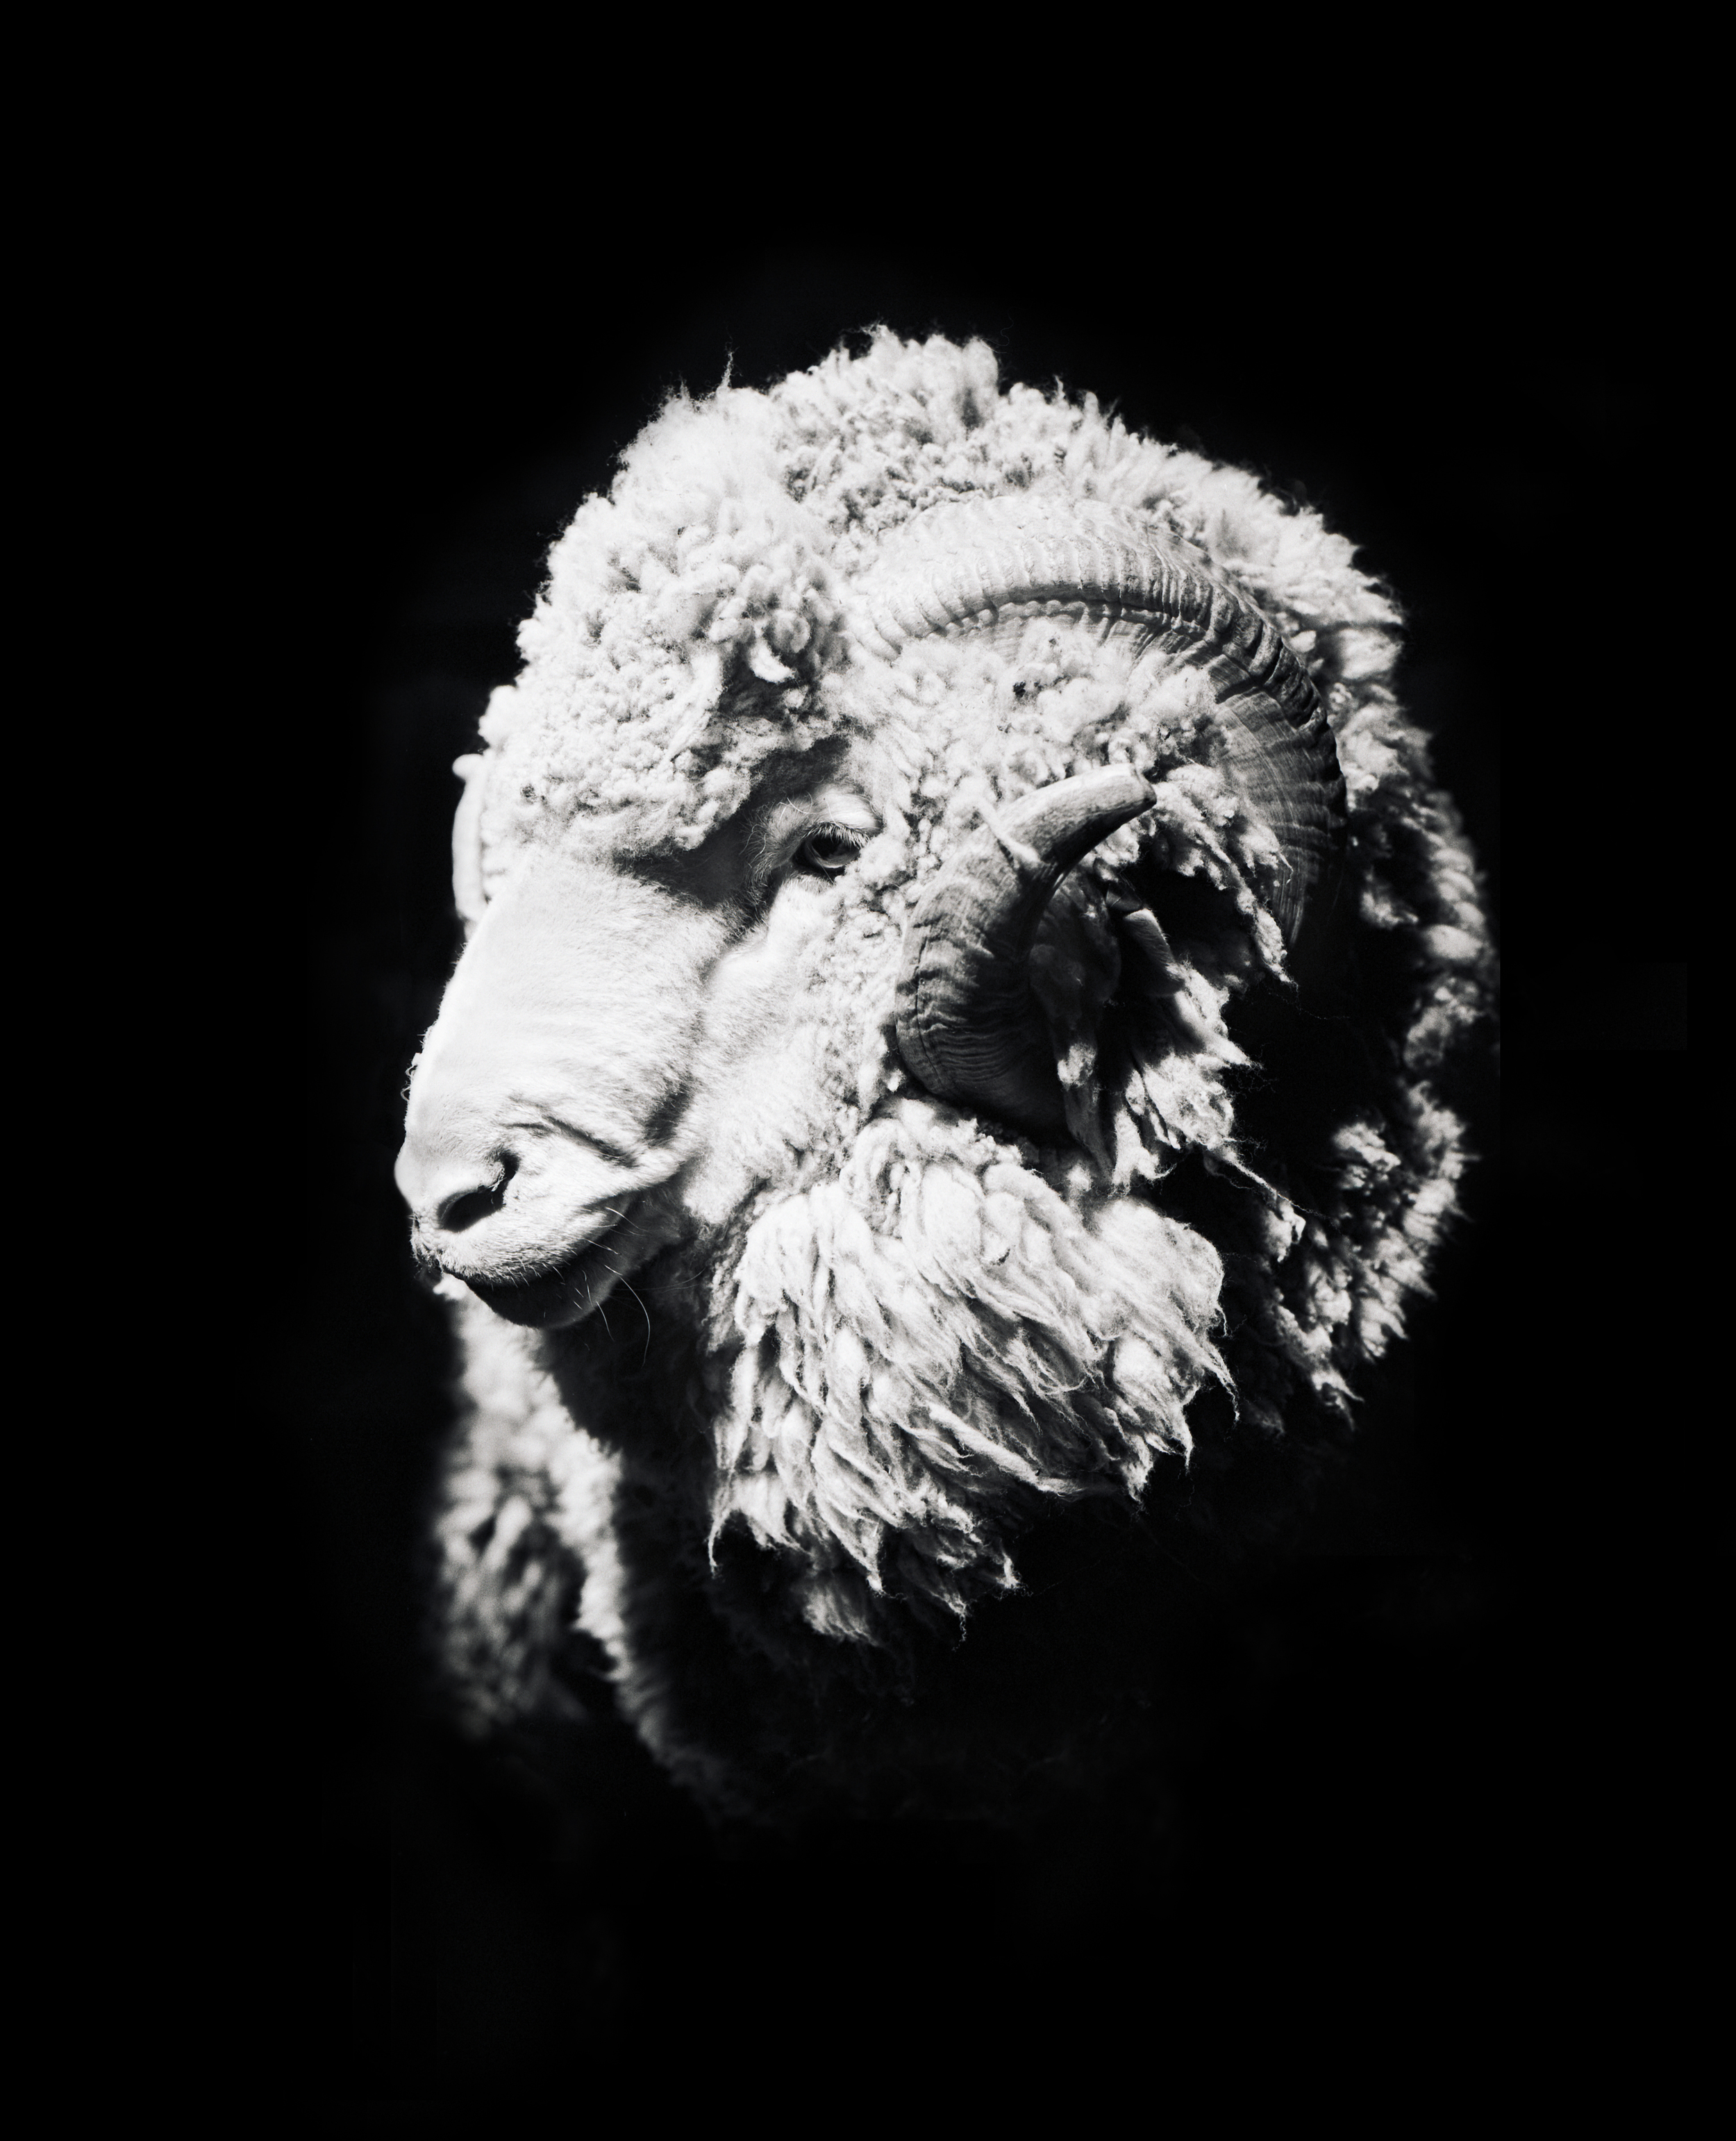 20030901-MB-sheepshear-007-copy.jpg